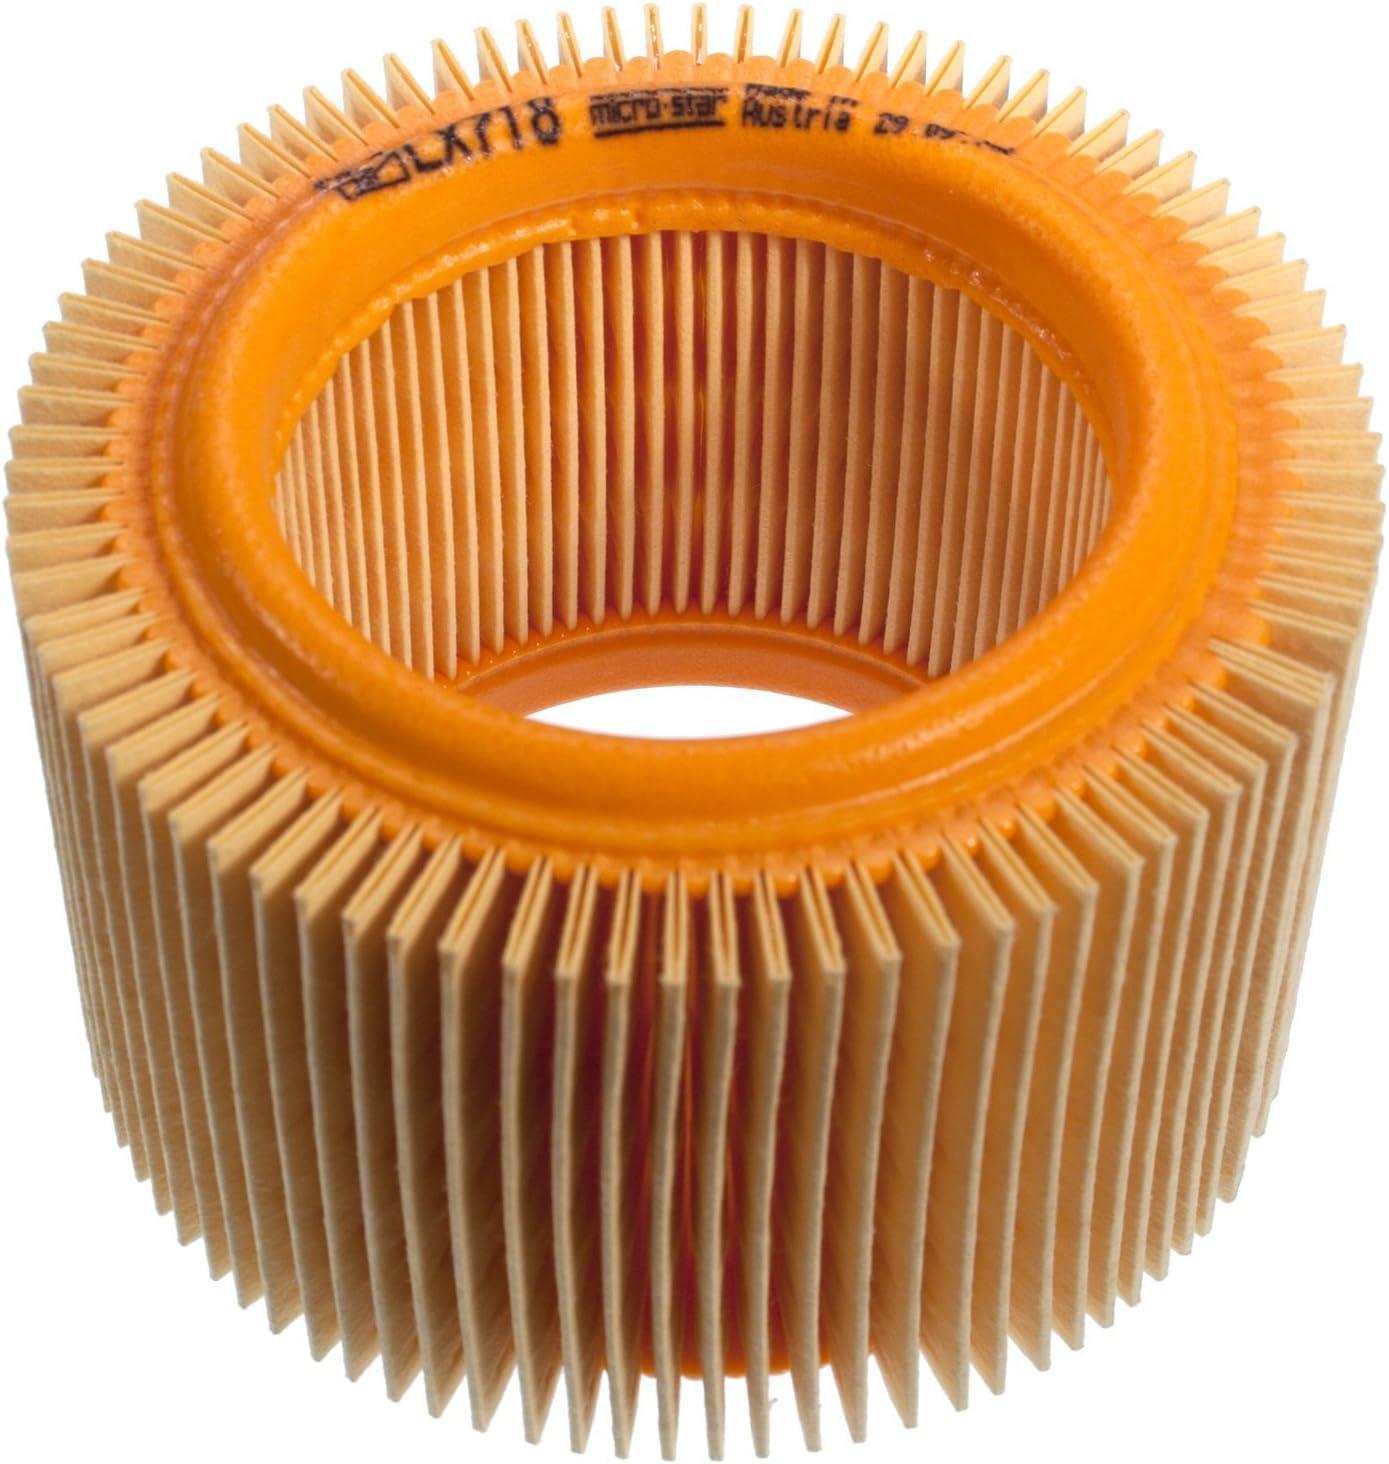 Knecht LX 718 Filtre /à air